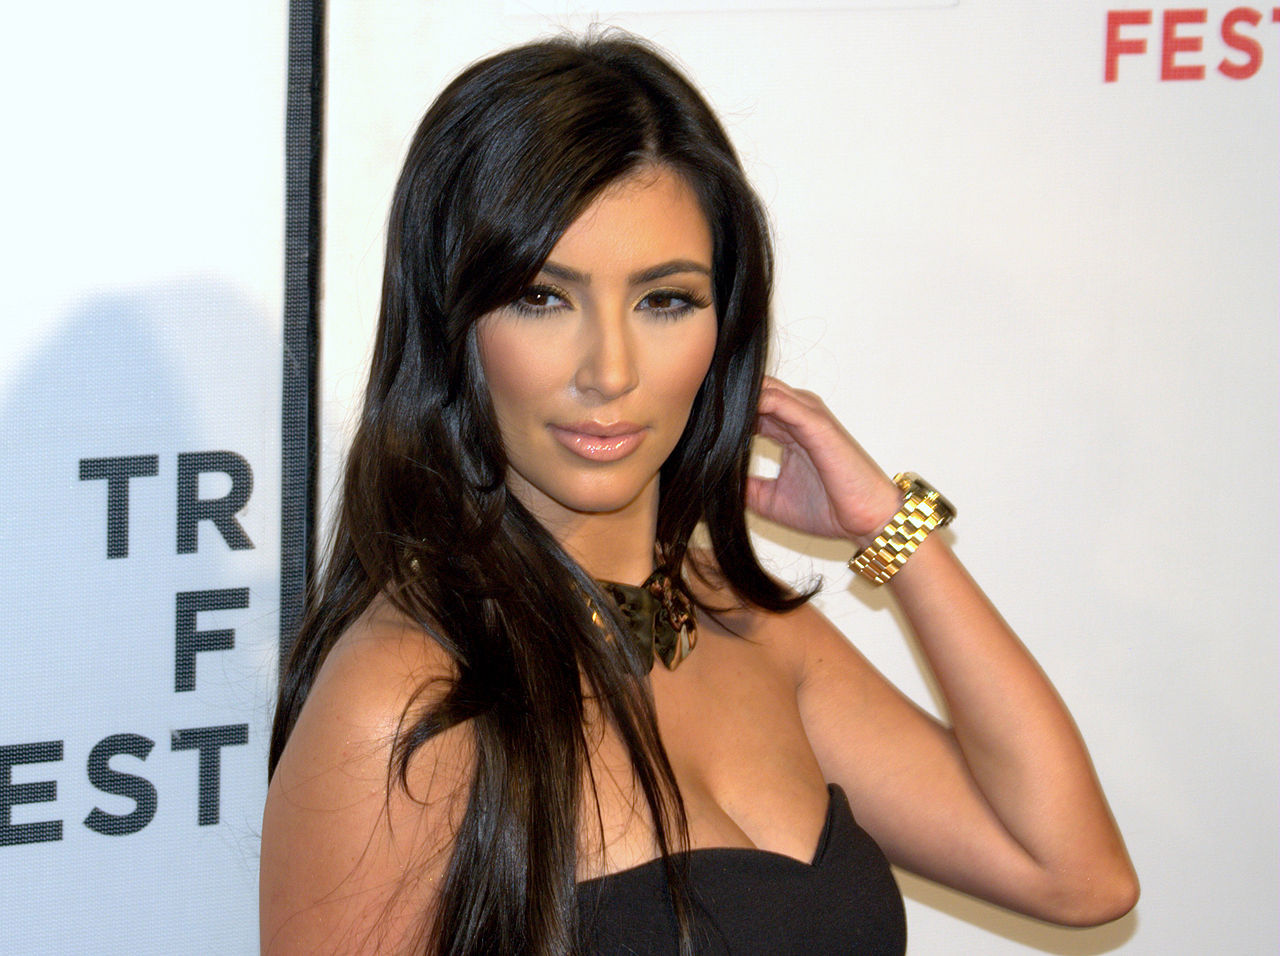 Kim Kardashian ska göra krim-podd på Spotify